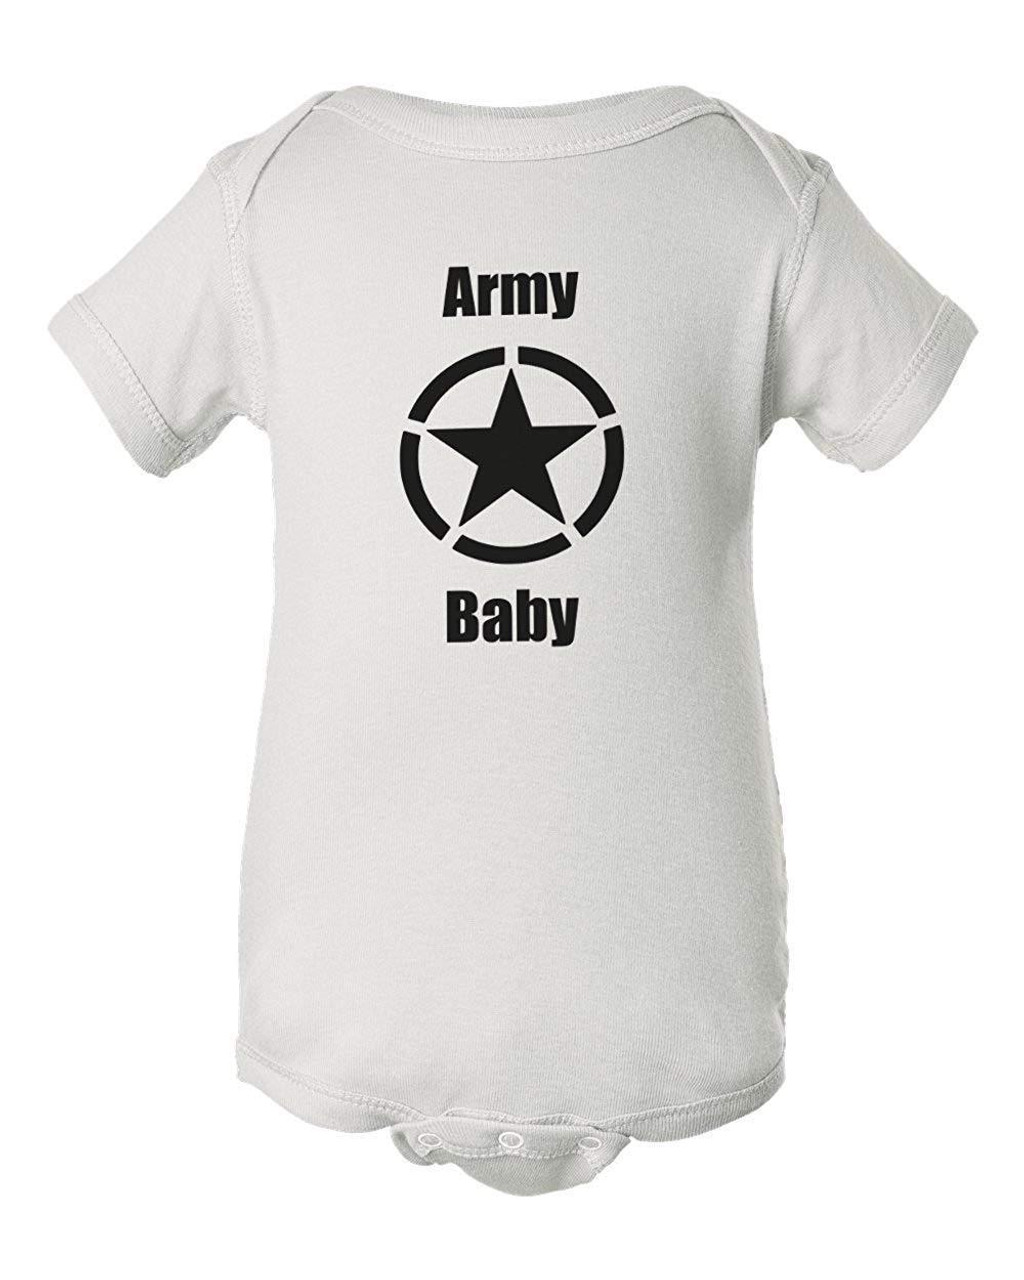 Army Baby White Bodysuit Romper Infant Jumper